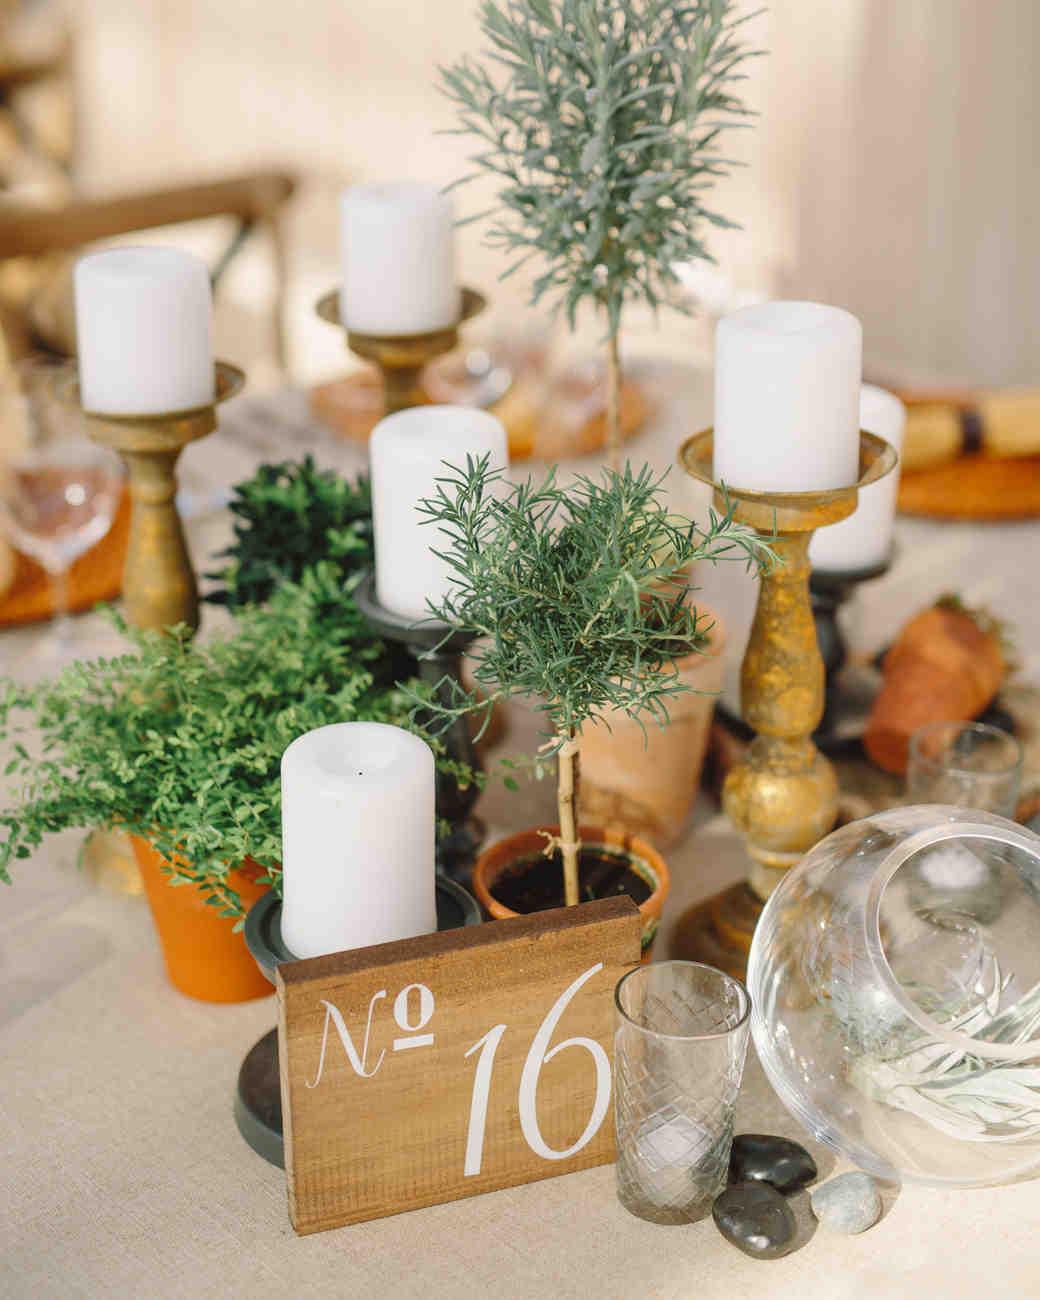 lizzy-bucky-wedding-tablenumber-326-s111857-0315.jpg